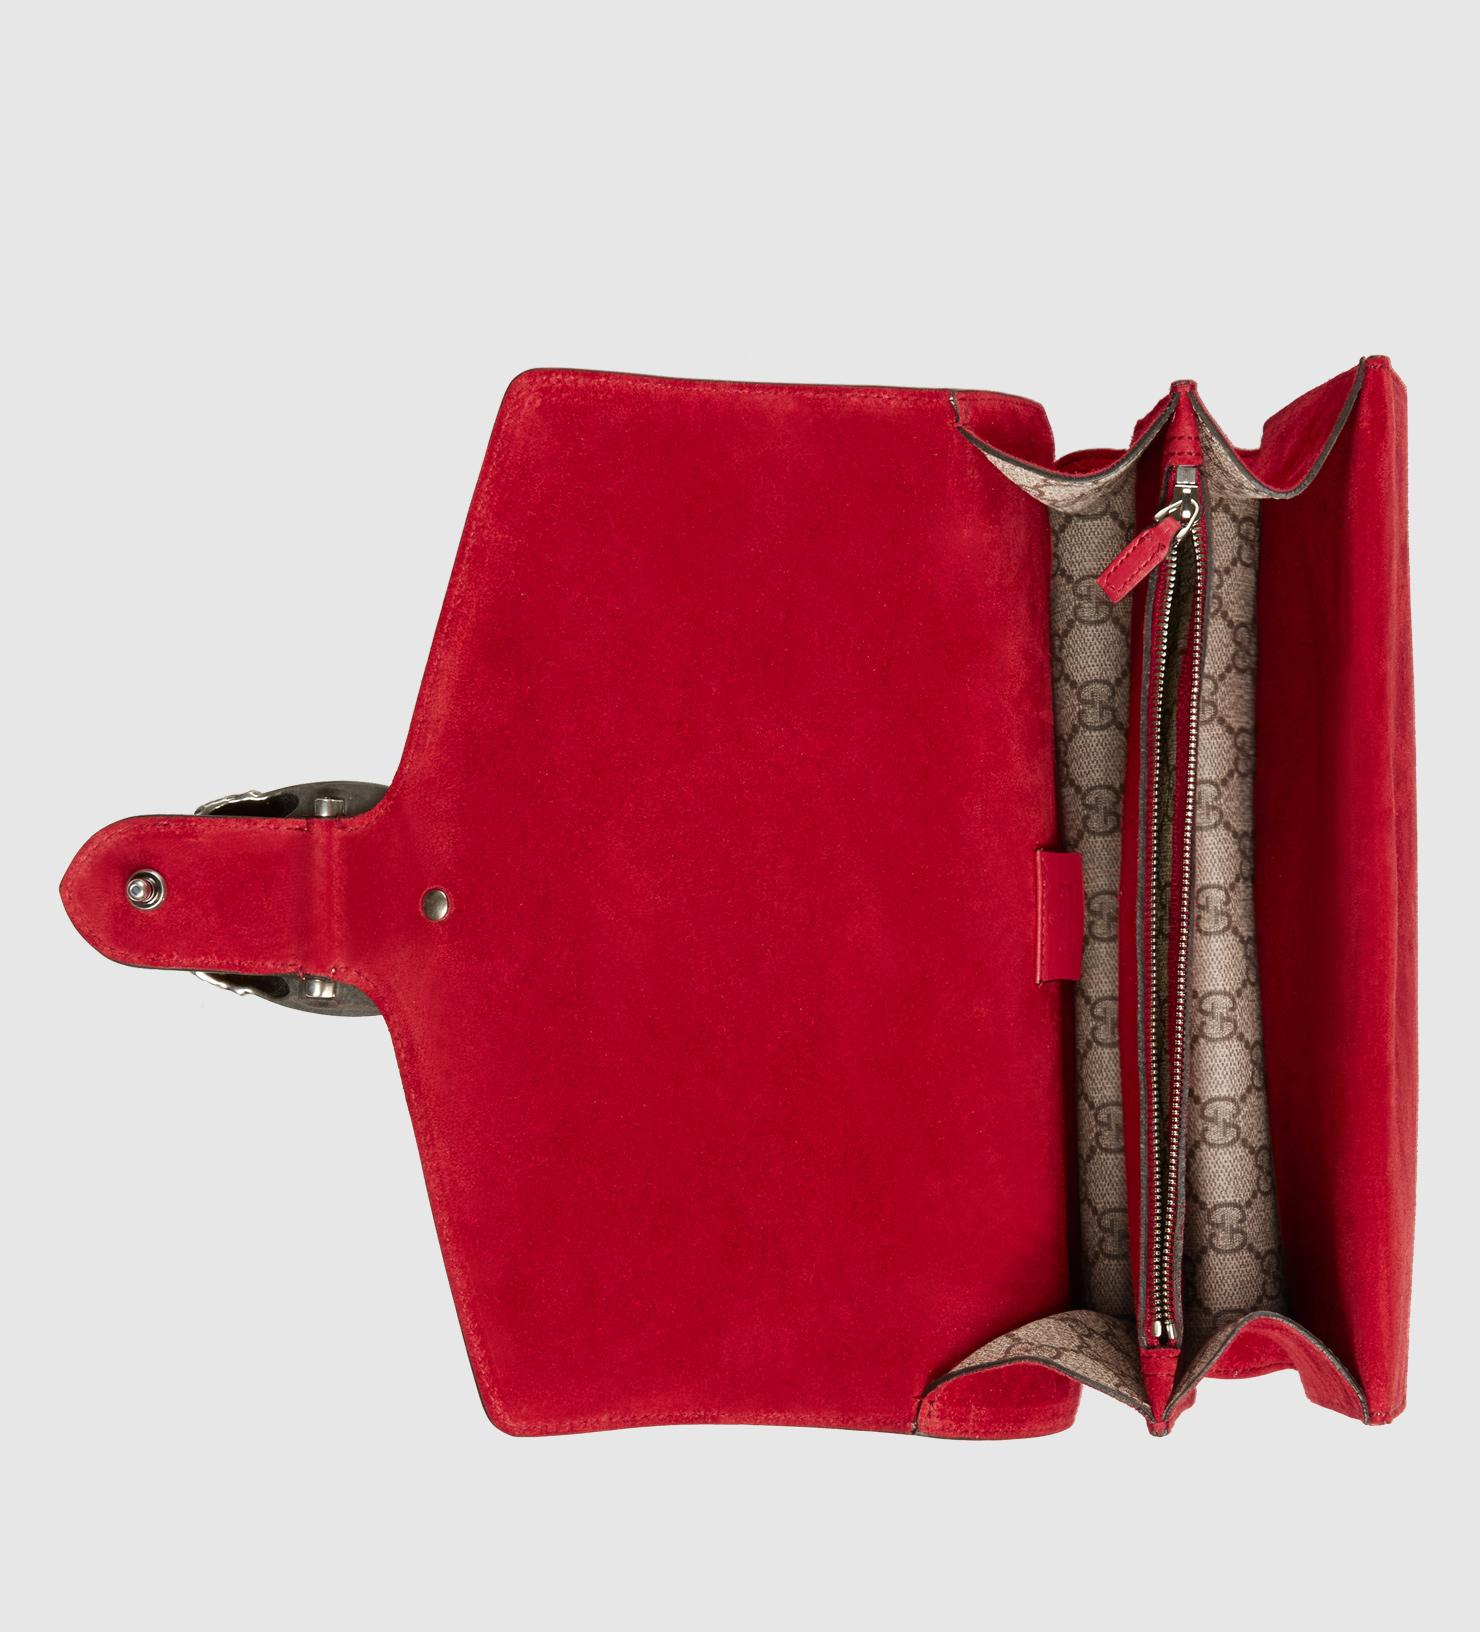 c13253c49629 Gucci Dionysus Gg Supreme Shoulder Bag in Natural - Lyst